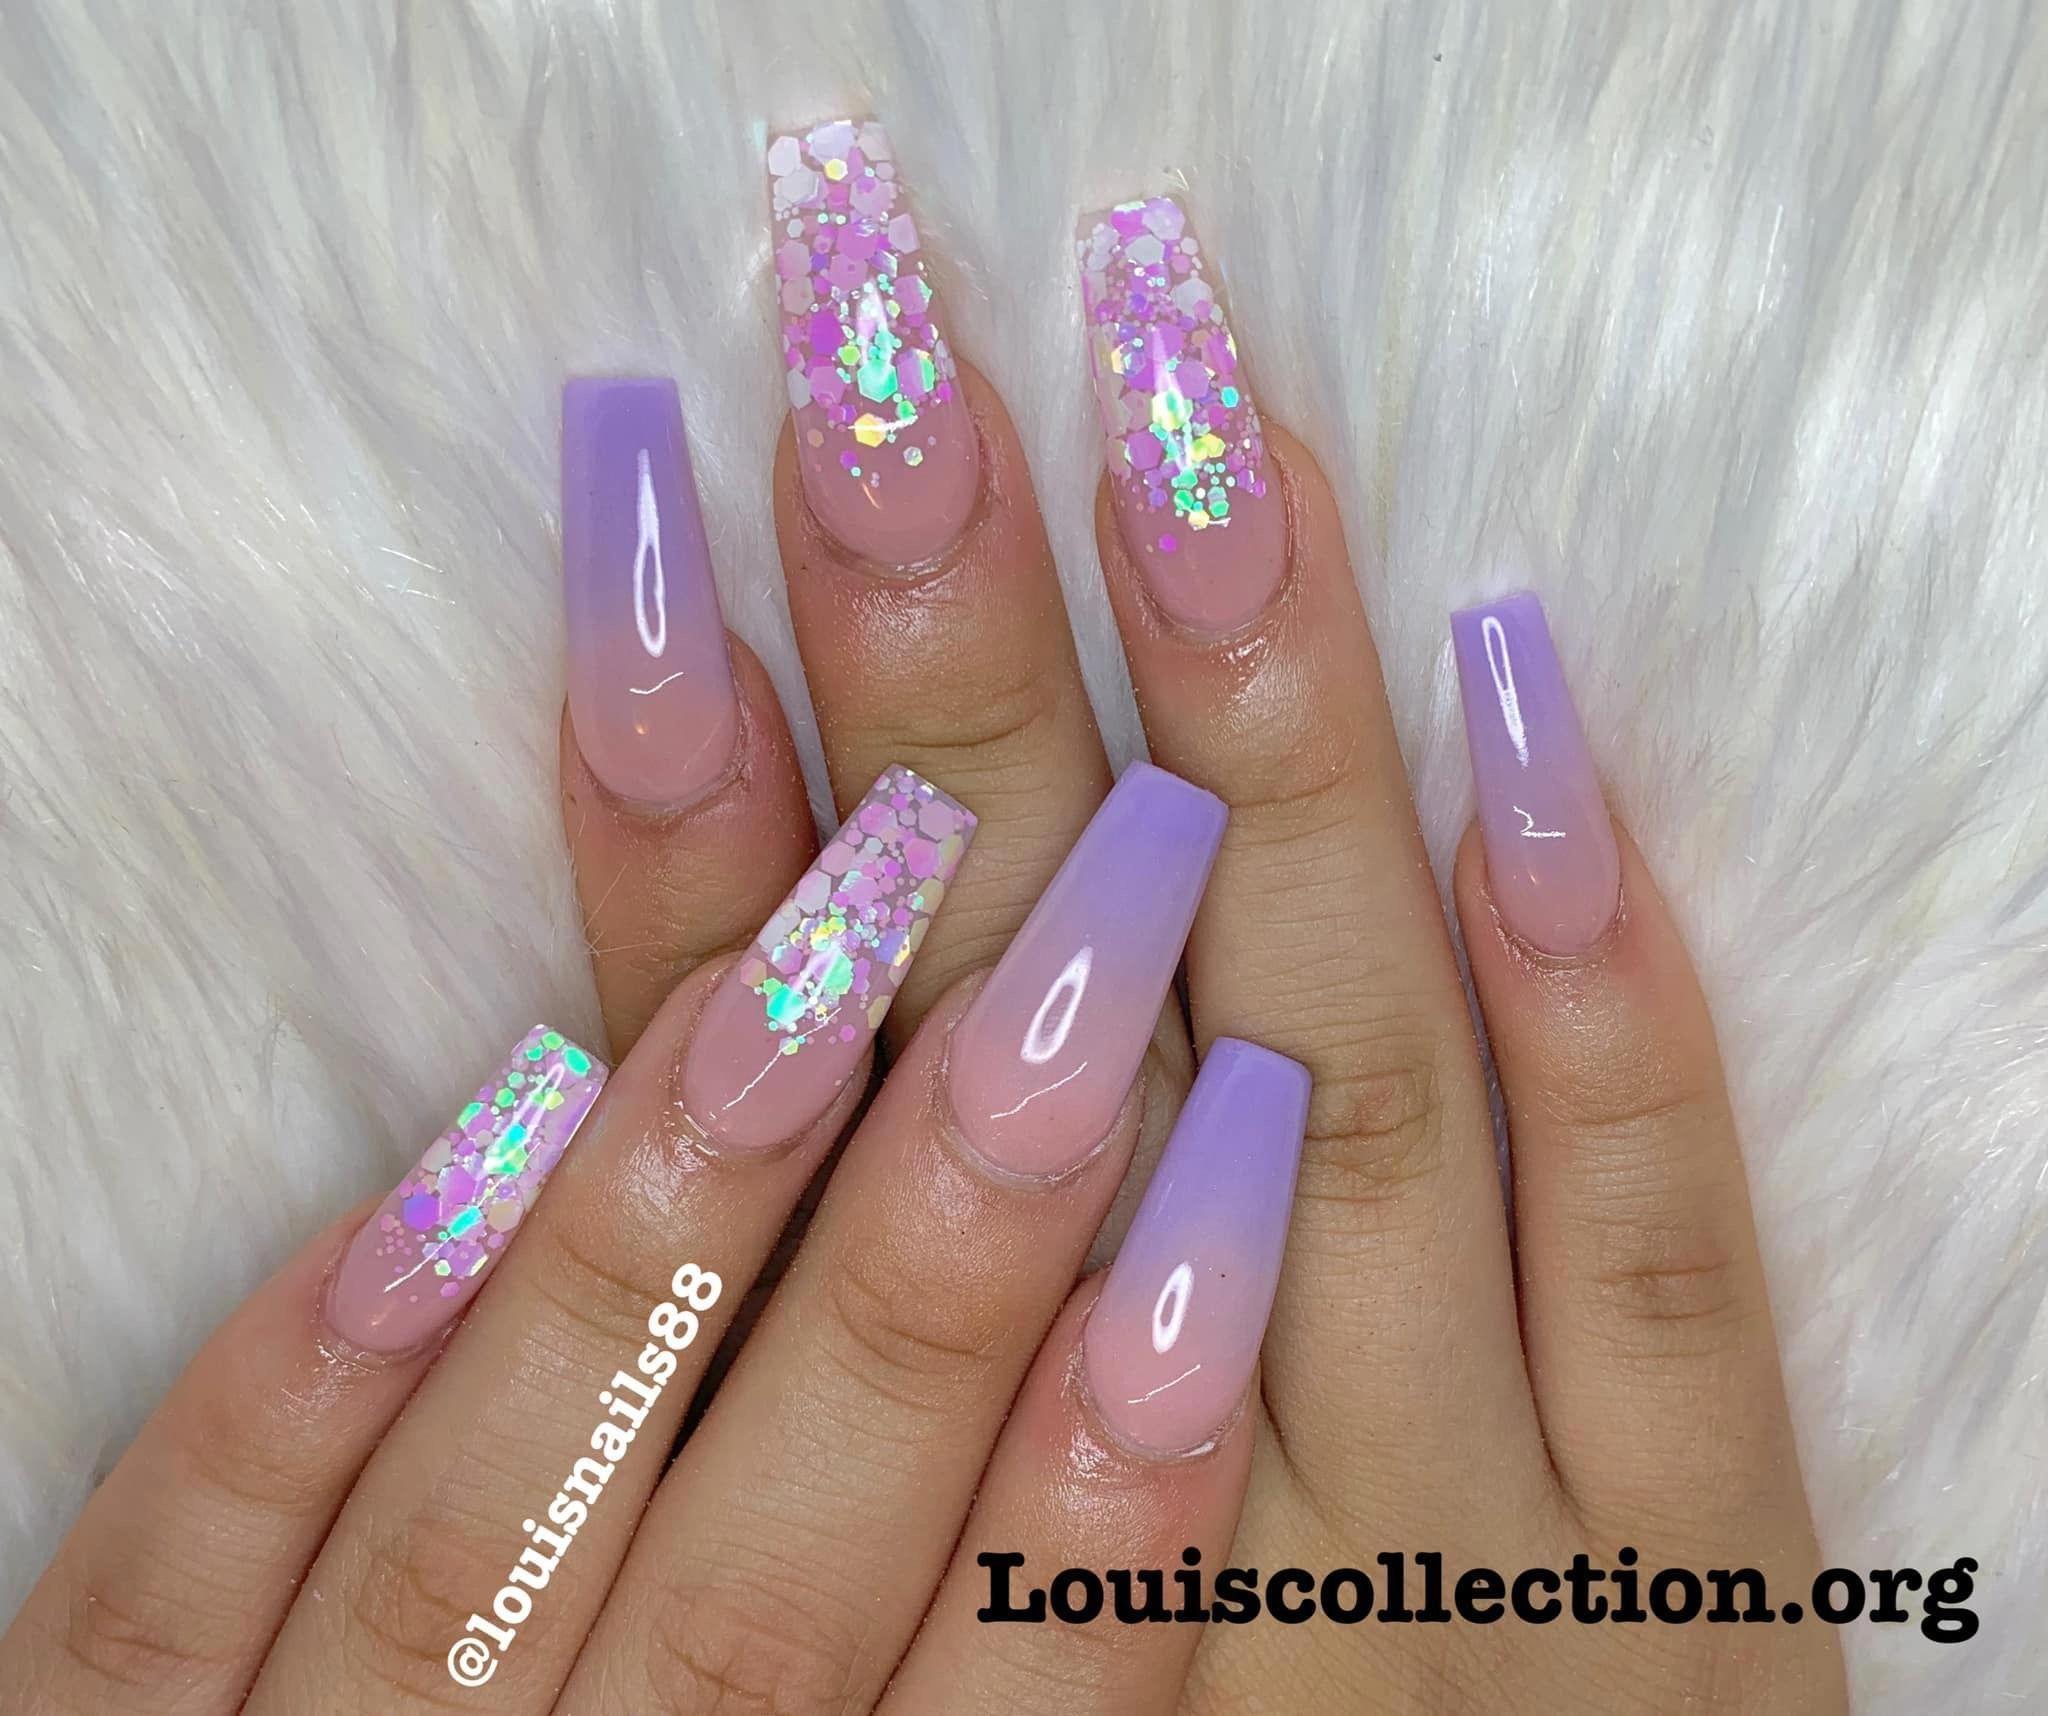 Pinterest Nail Inspo Acrylicnailsideas Glitternailsacrylic In 2020 Purple Acrylic Nails Swag Nails Ombre Acrylic Nails